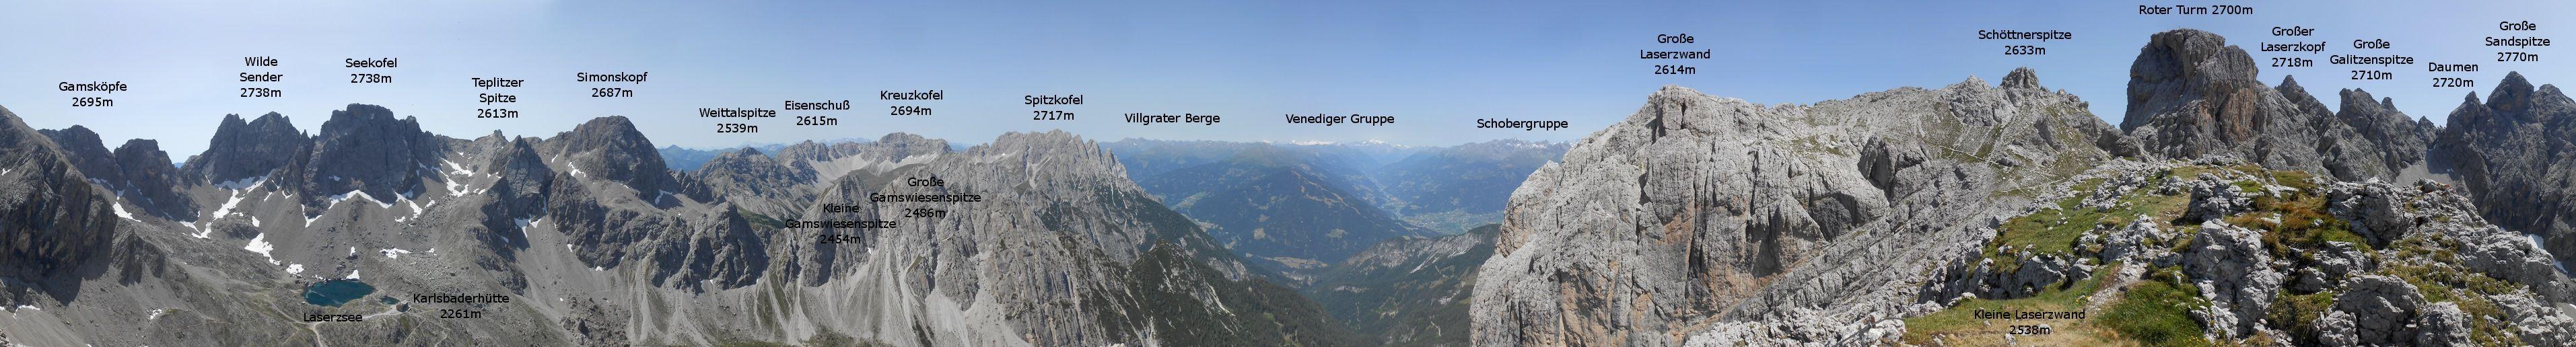 Panorama_KleineLaserzwand